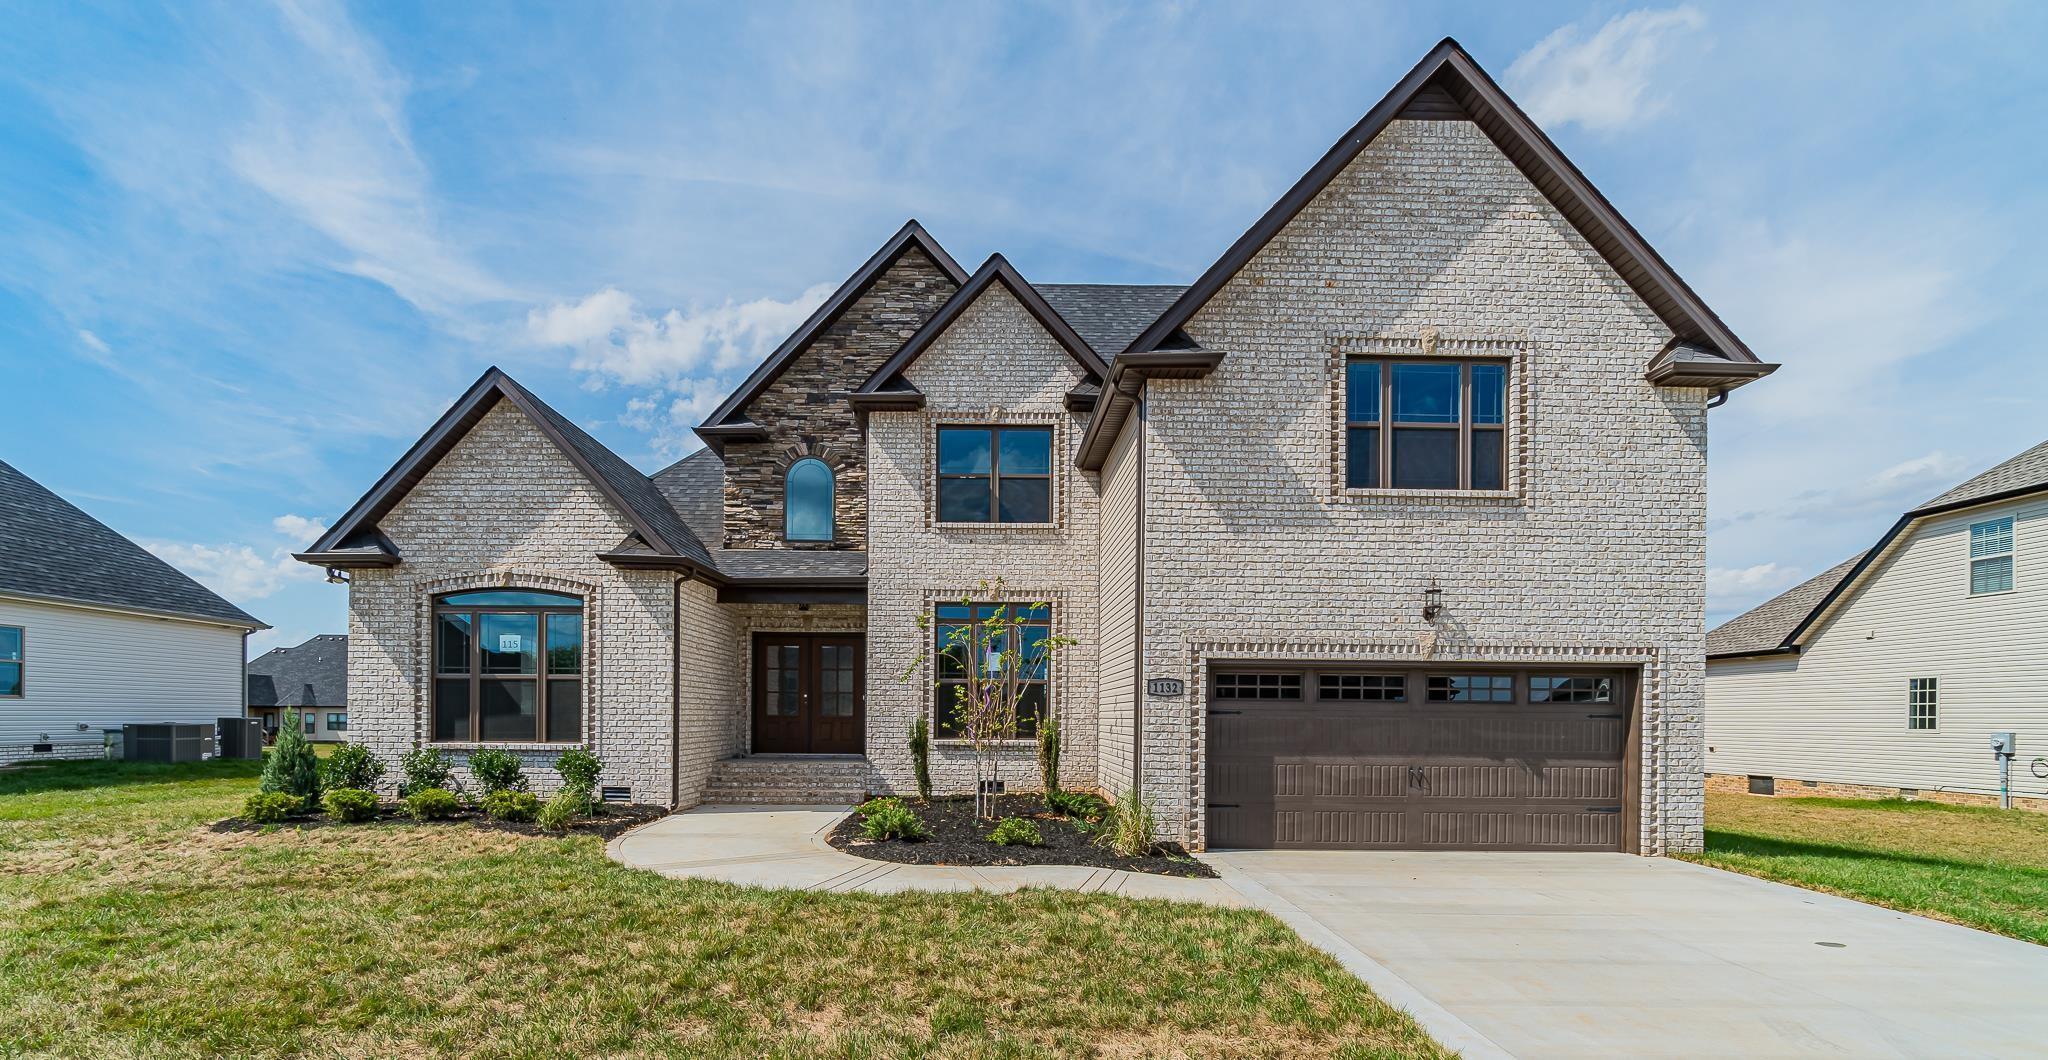 6404 Blacksmith Dr, Pleasant View, TN 37146 - Pleasant View, TN real estate listing